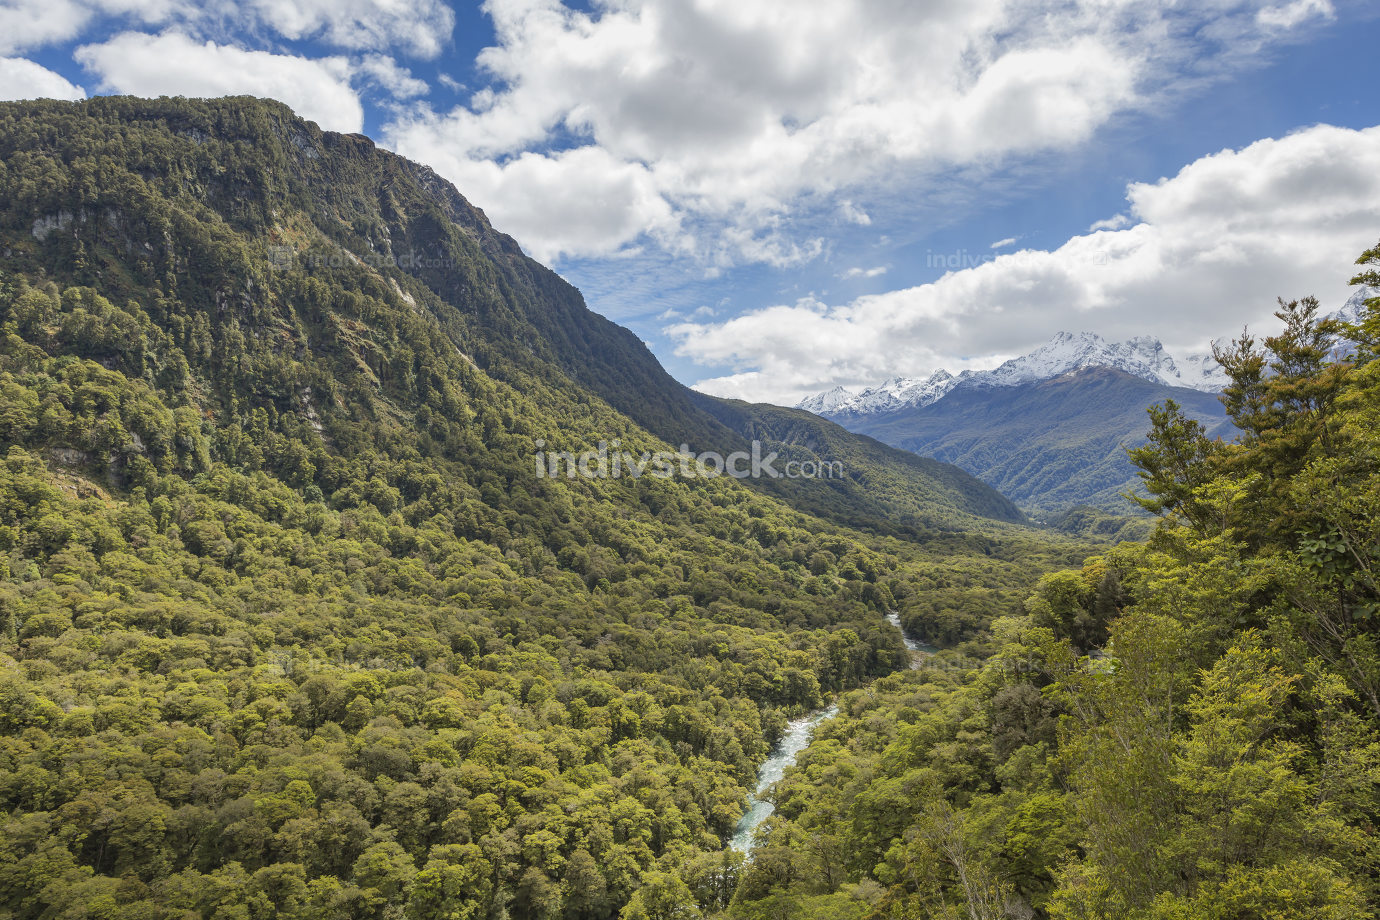 The Chasm (Fiordland, South Island, New Zealand)